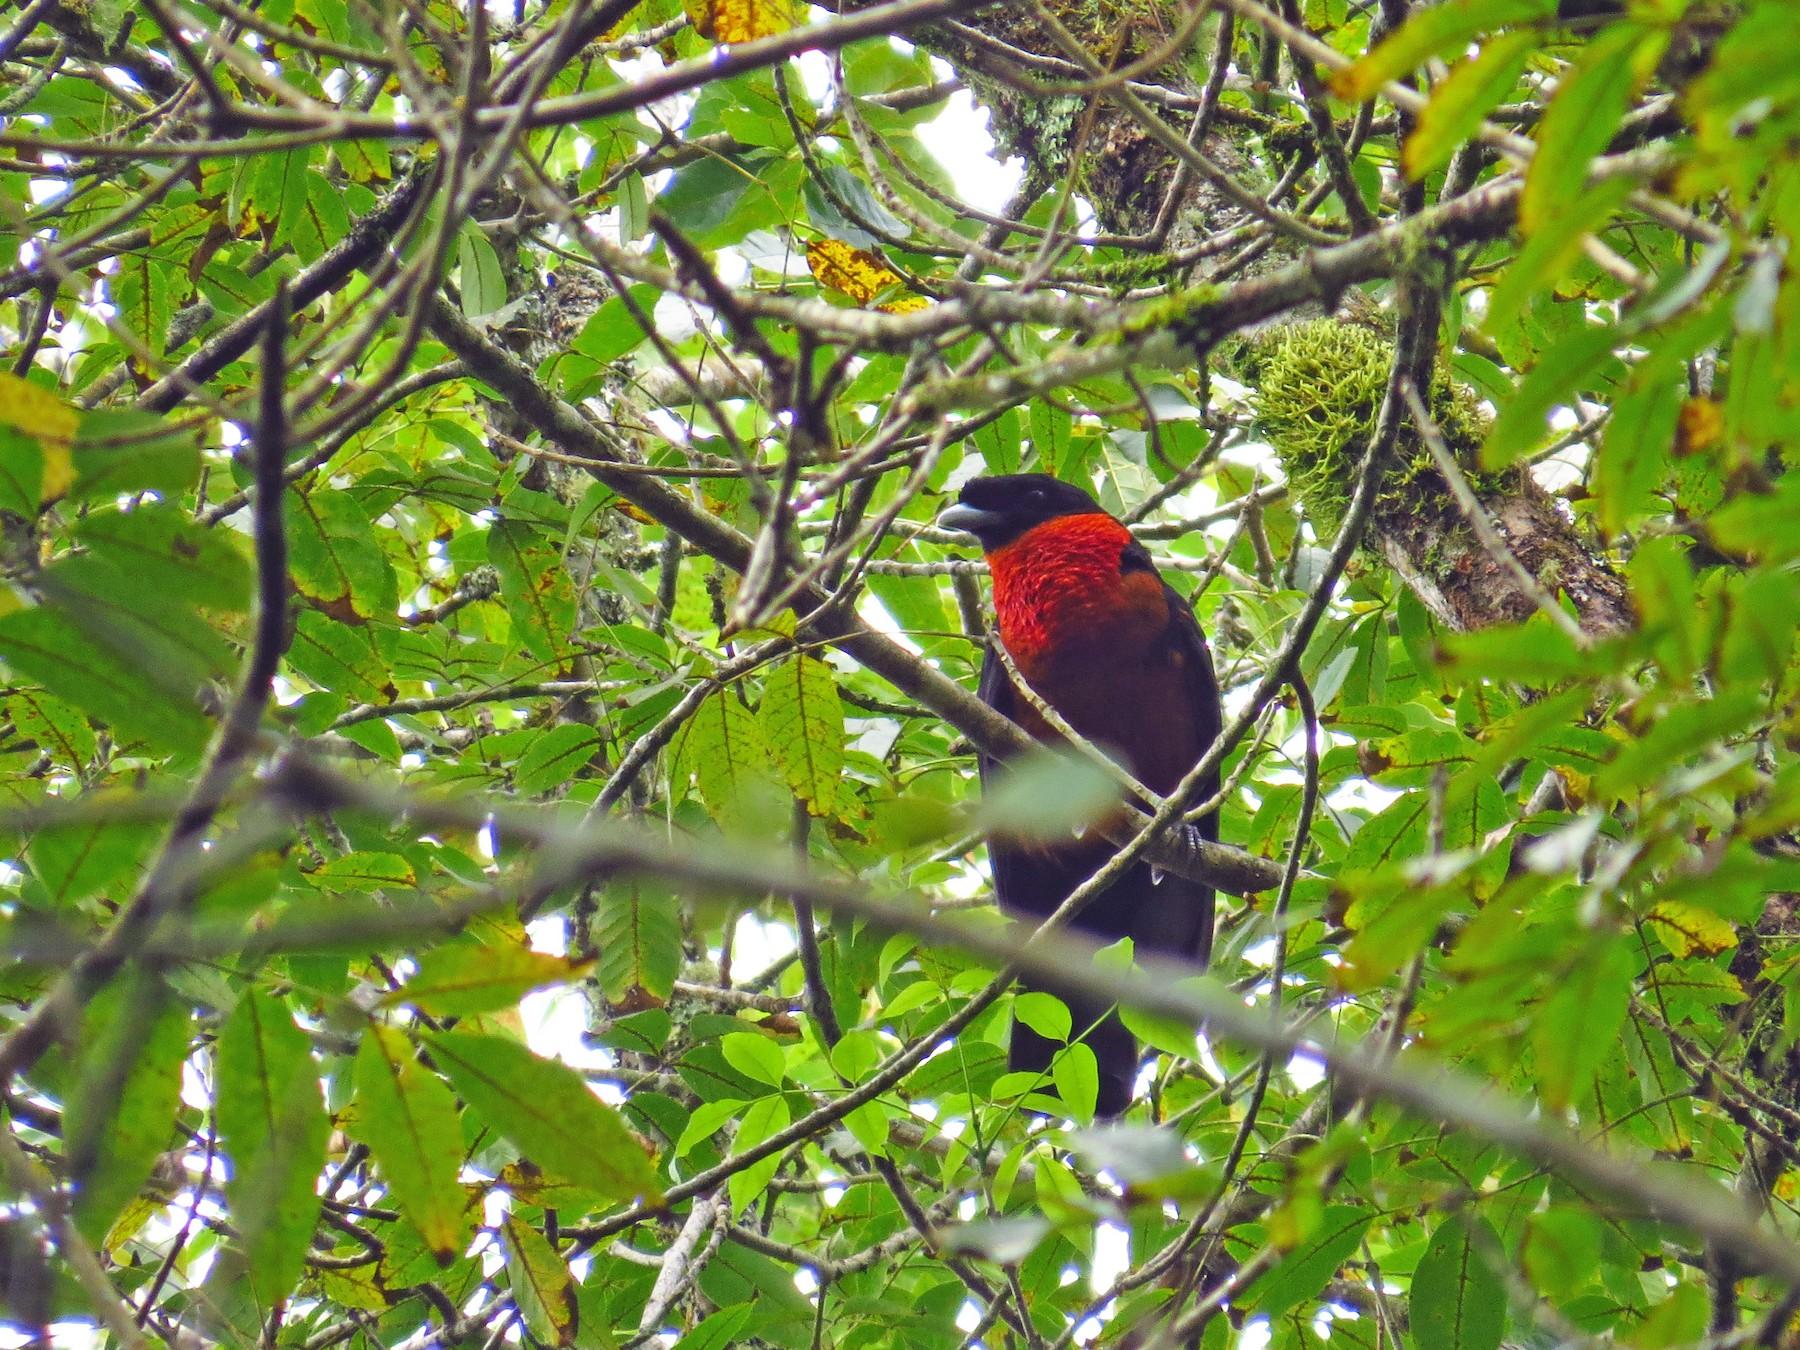 Red-ruffed Fruitcrow - Jorge Muñoz García   CAQUETA BIRDING